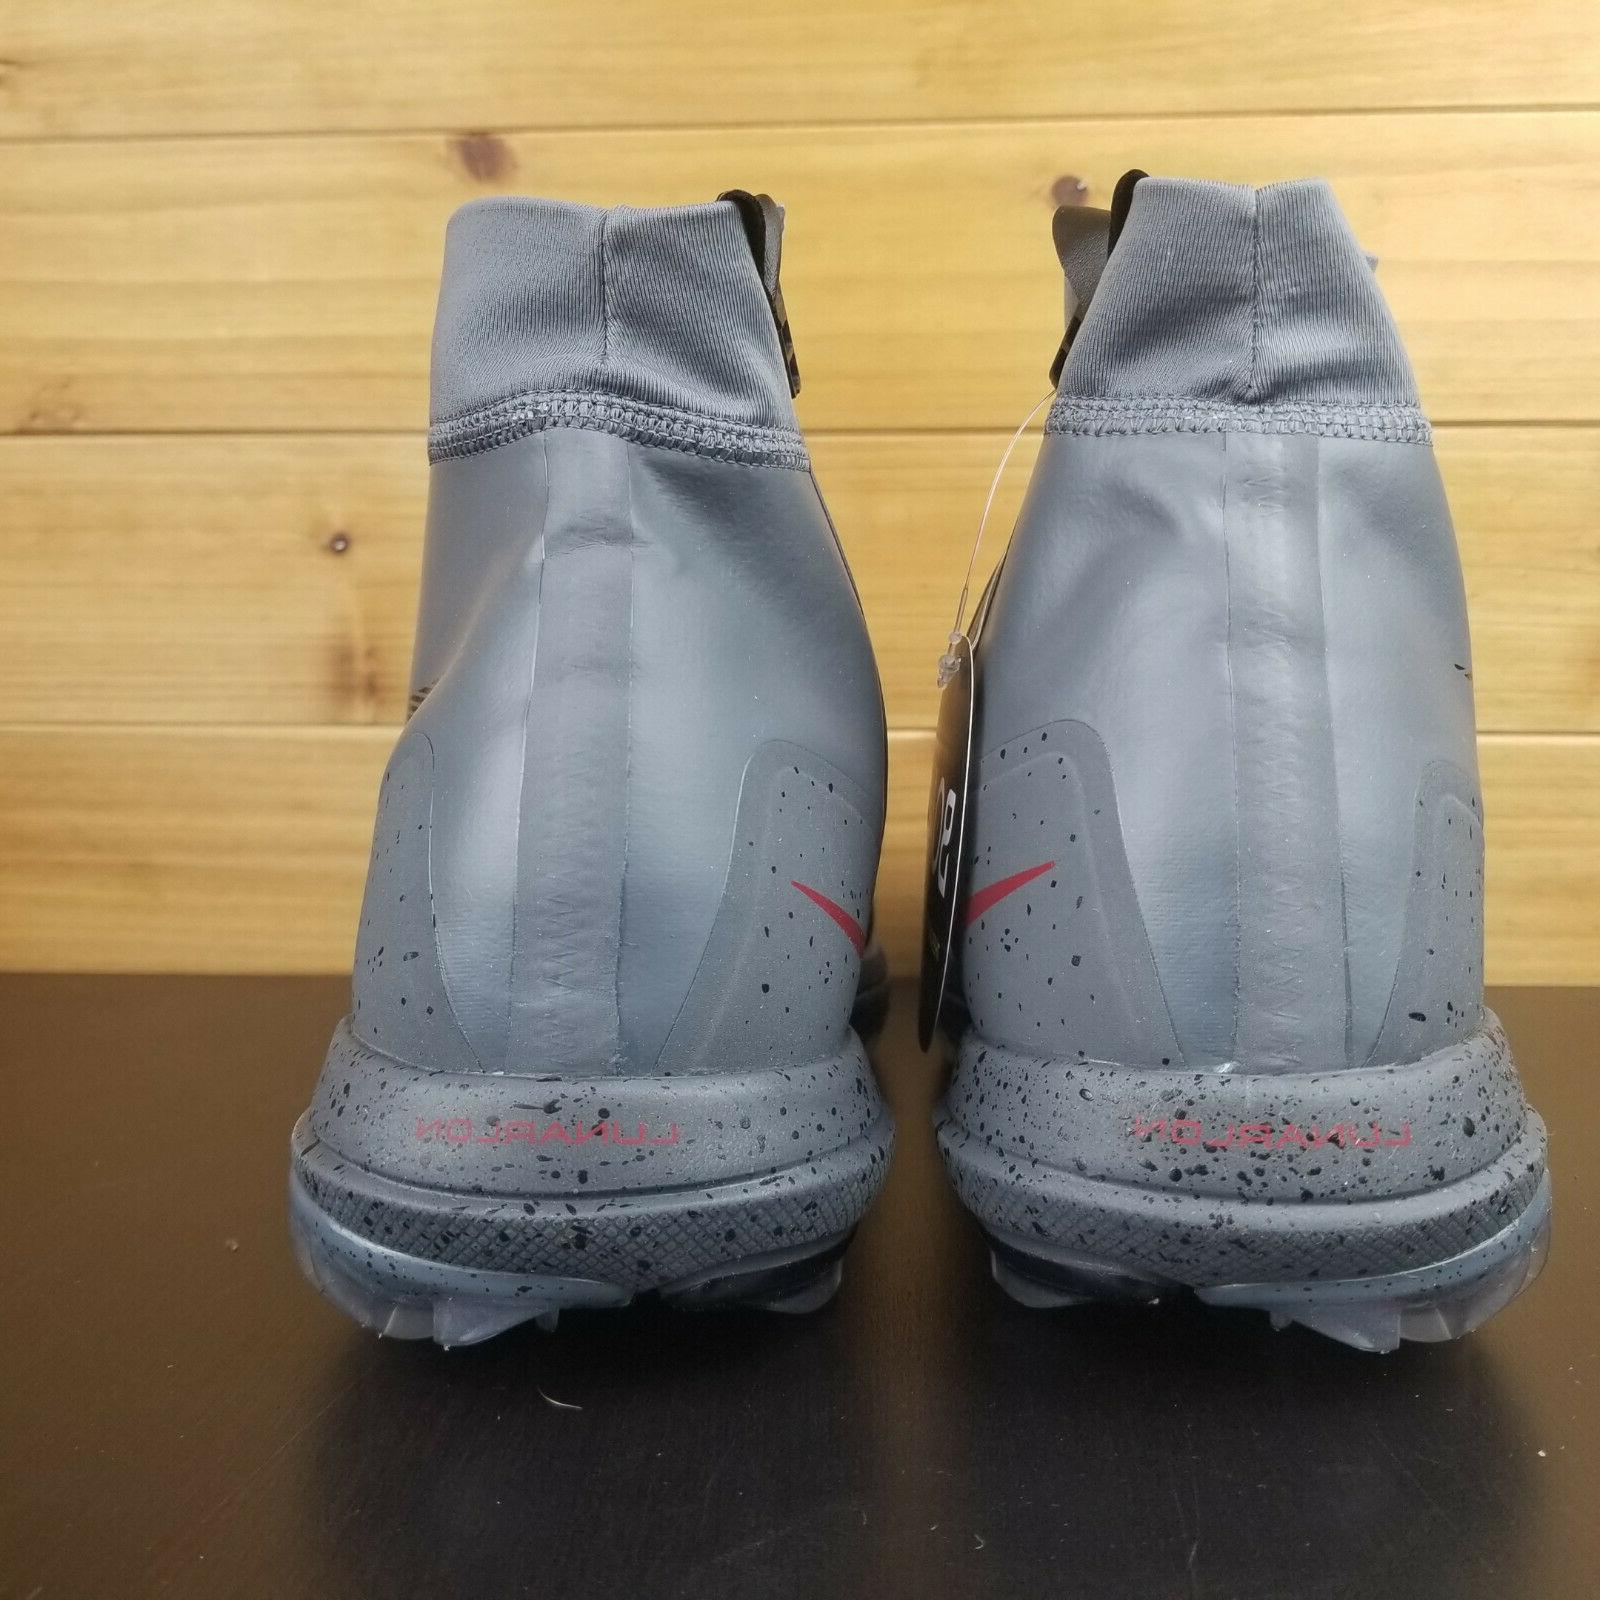 Nike Lunar Vaporstorm Shoes Gray Men's Waterproof